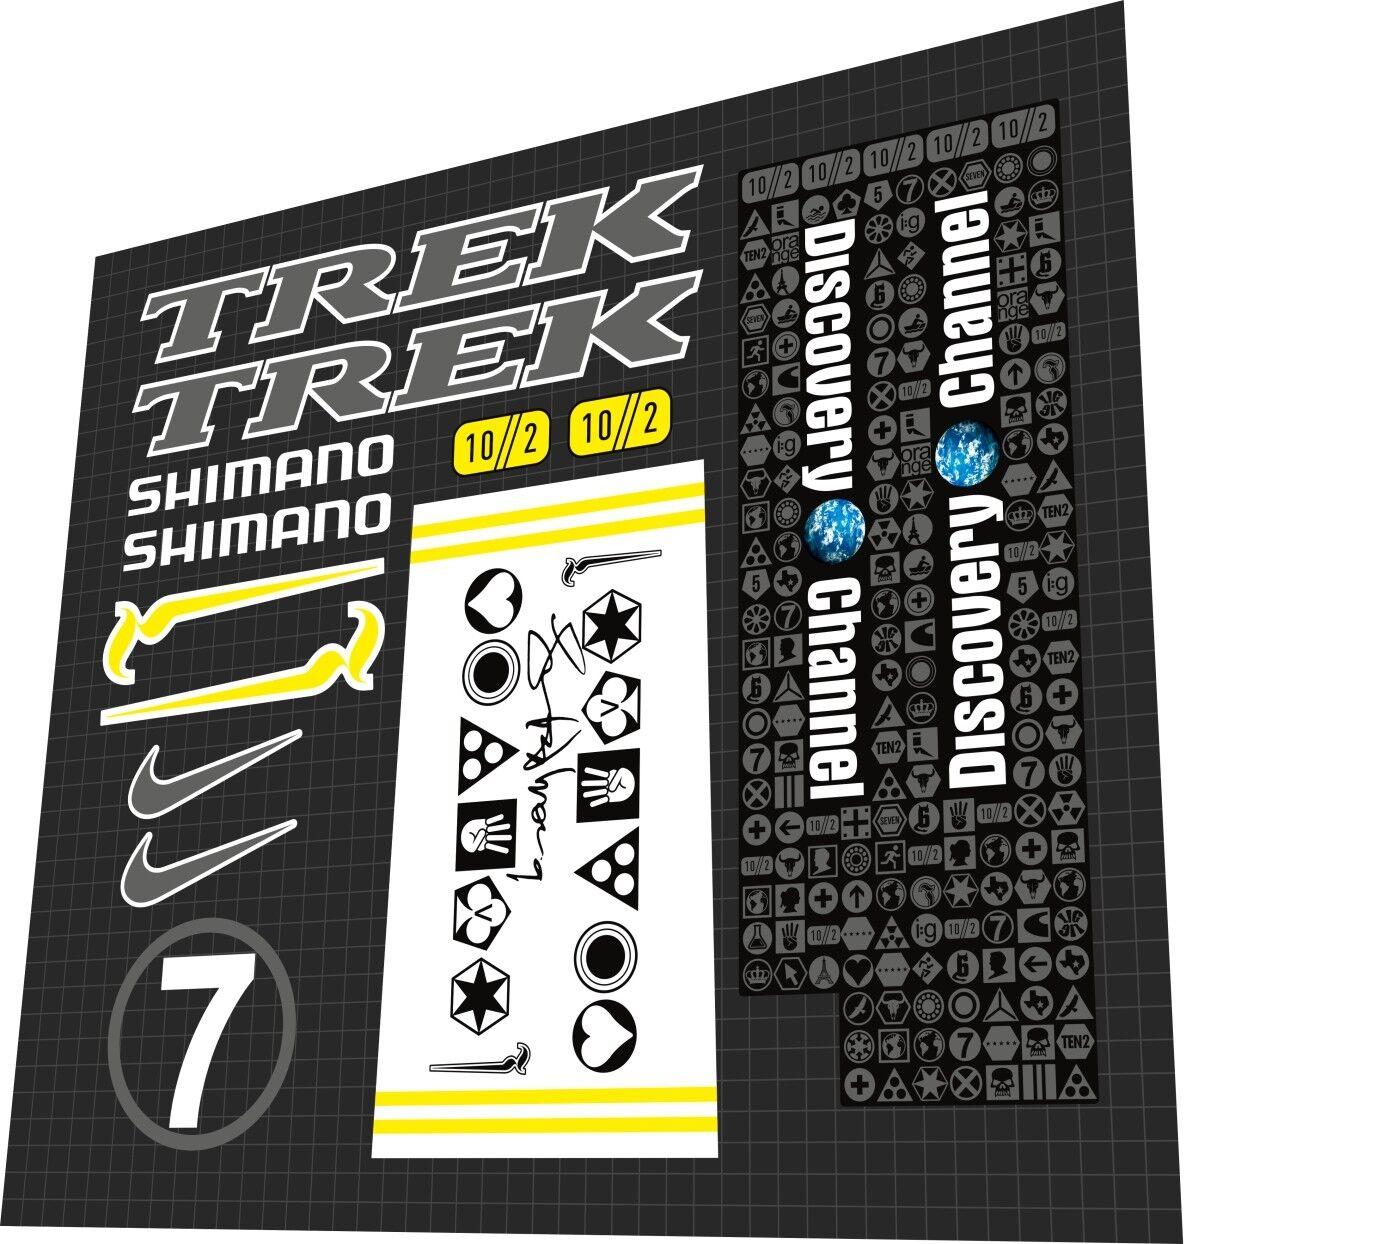 TREK 2005 Tour De France Madone Lance Armstrong decal set